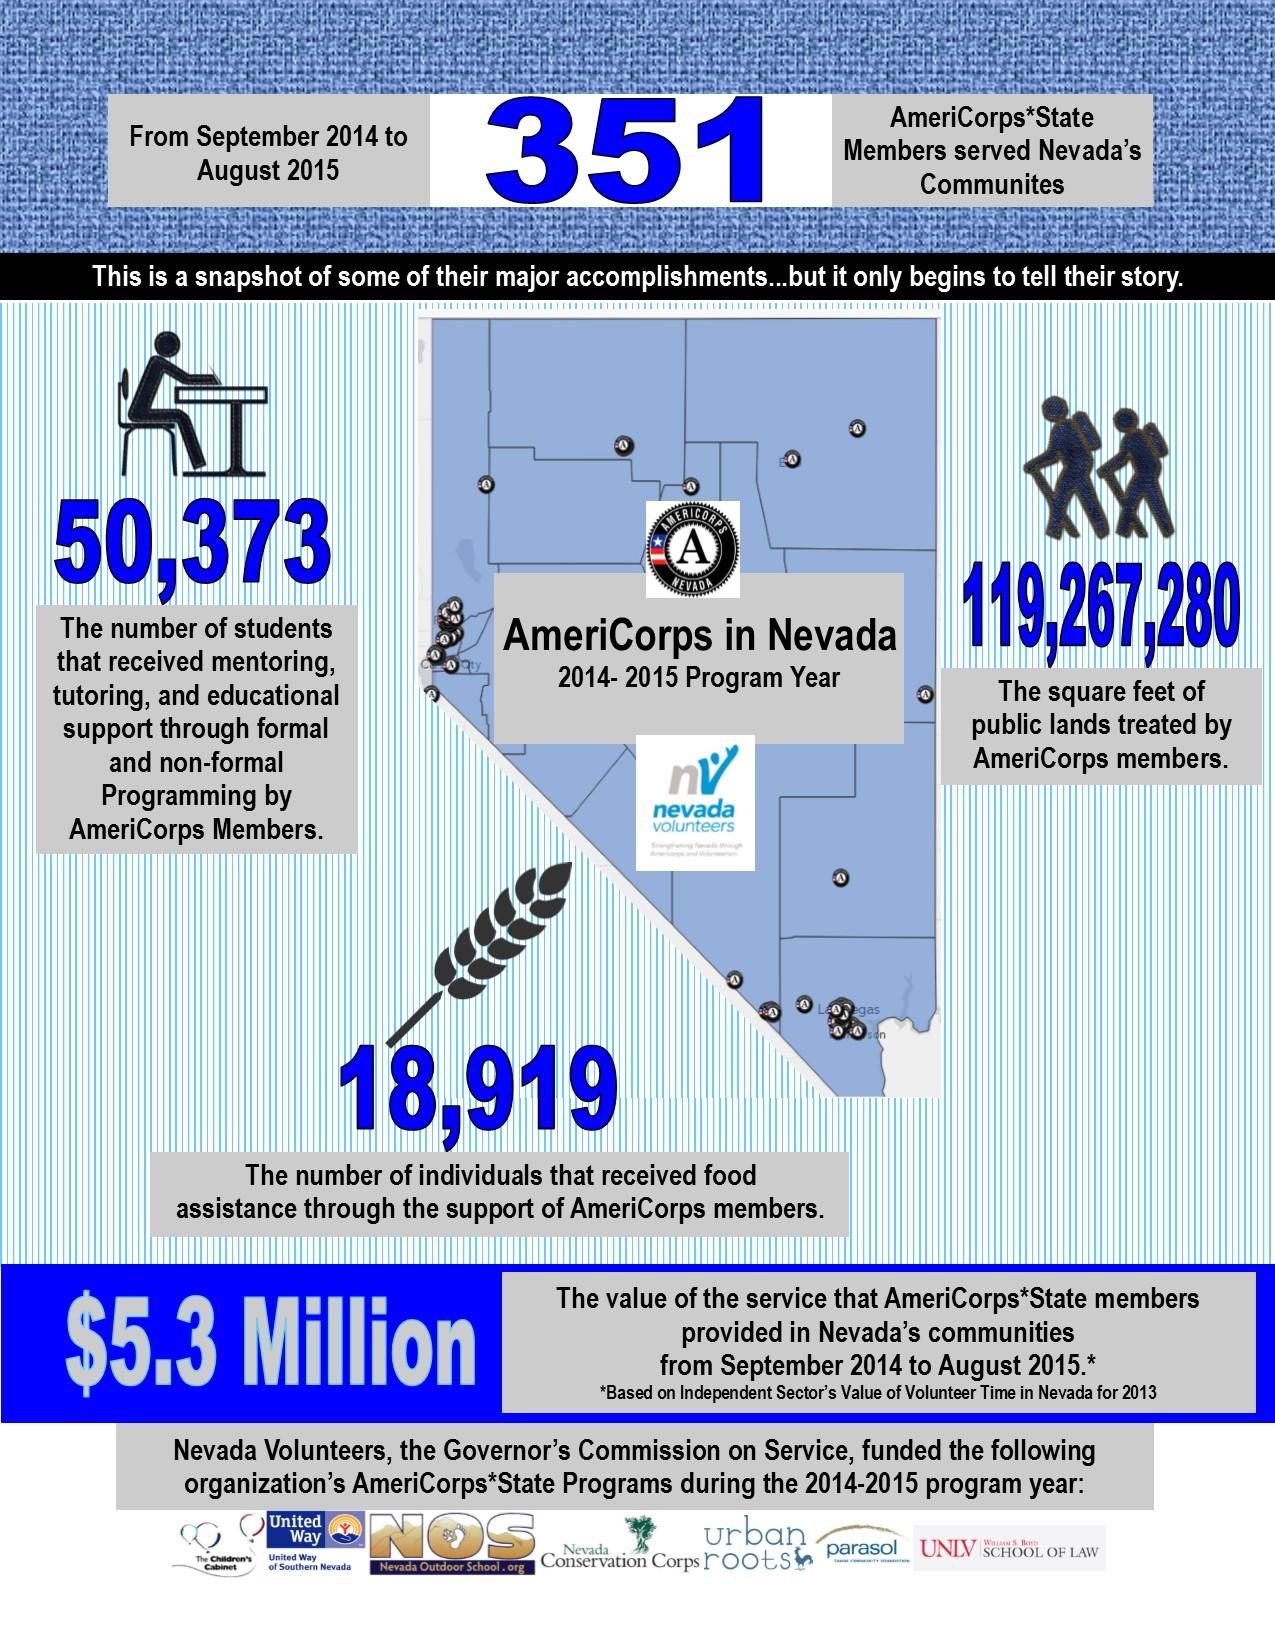 2014-15 infographic data